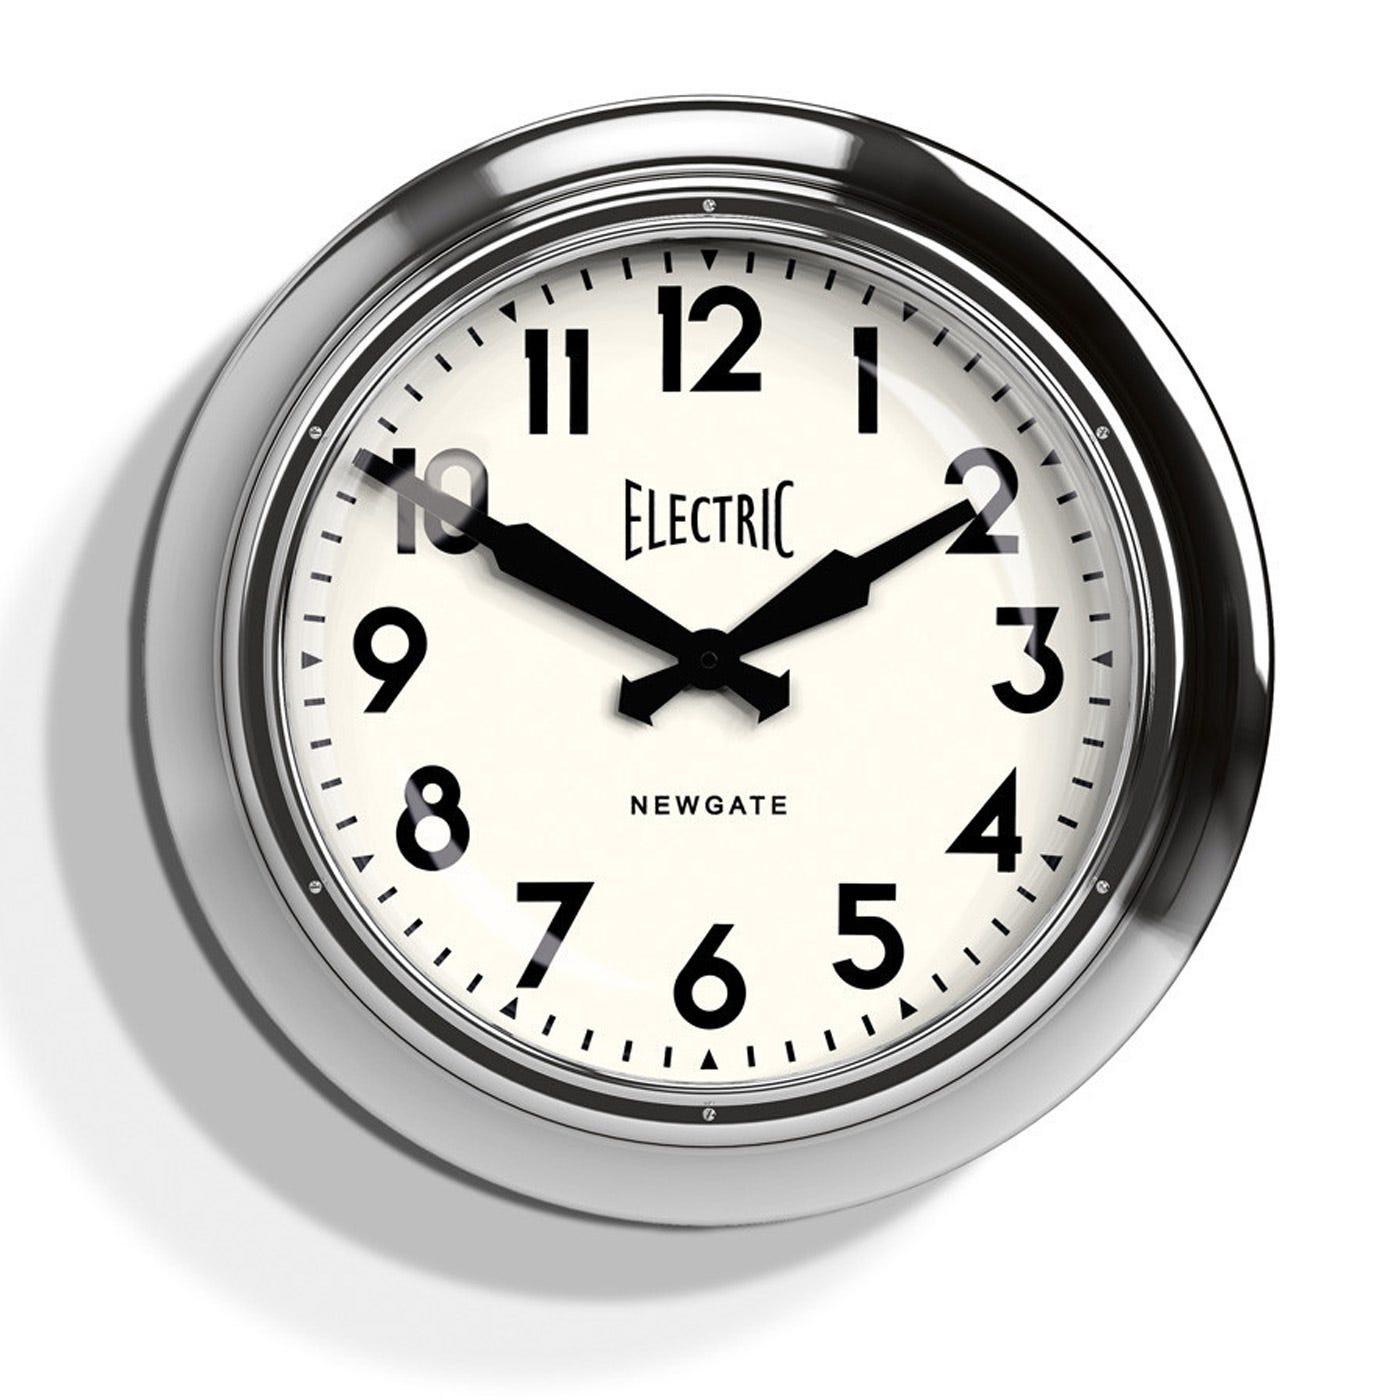 Newgate Electric 50s Chrome Wall Clock